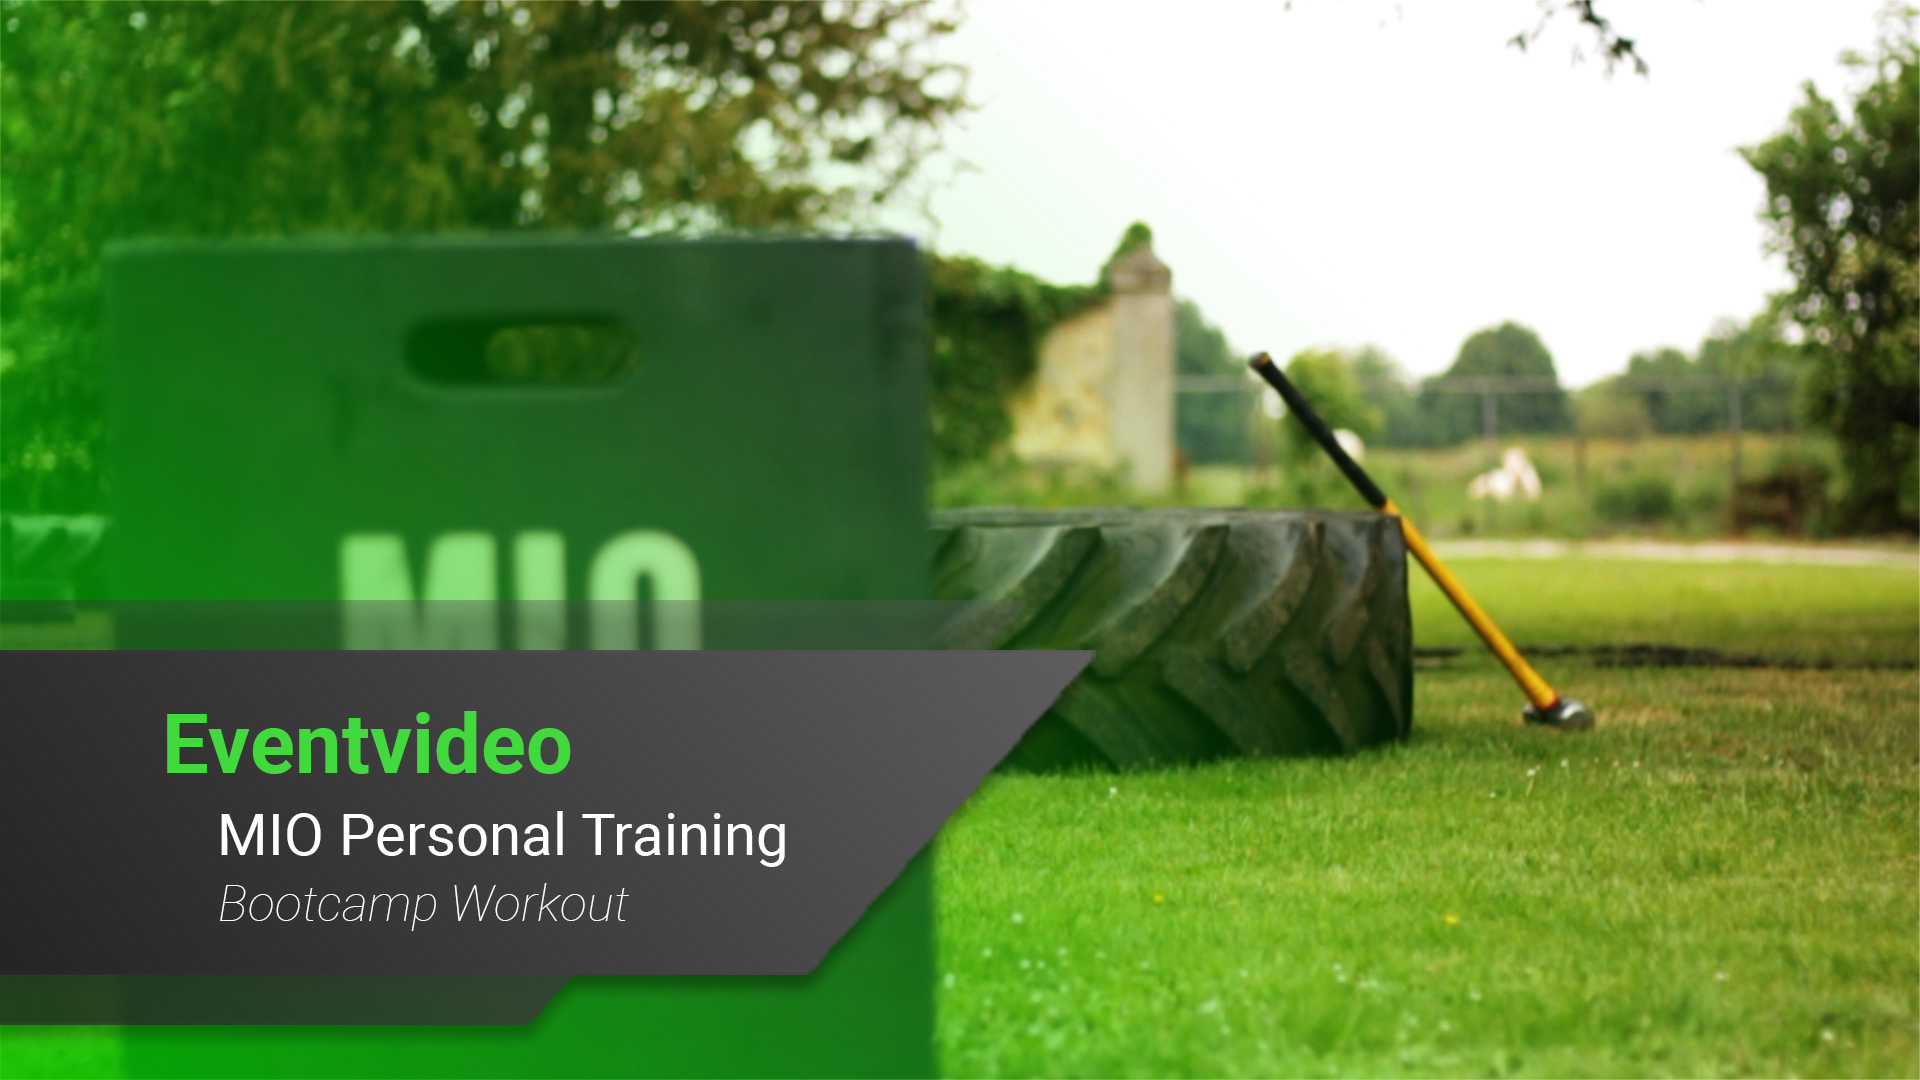 MIO Personal Training